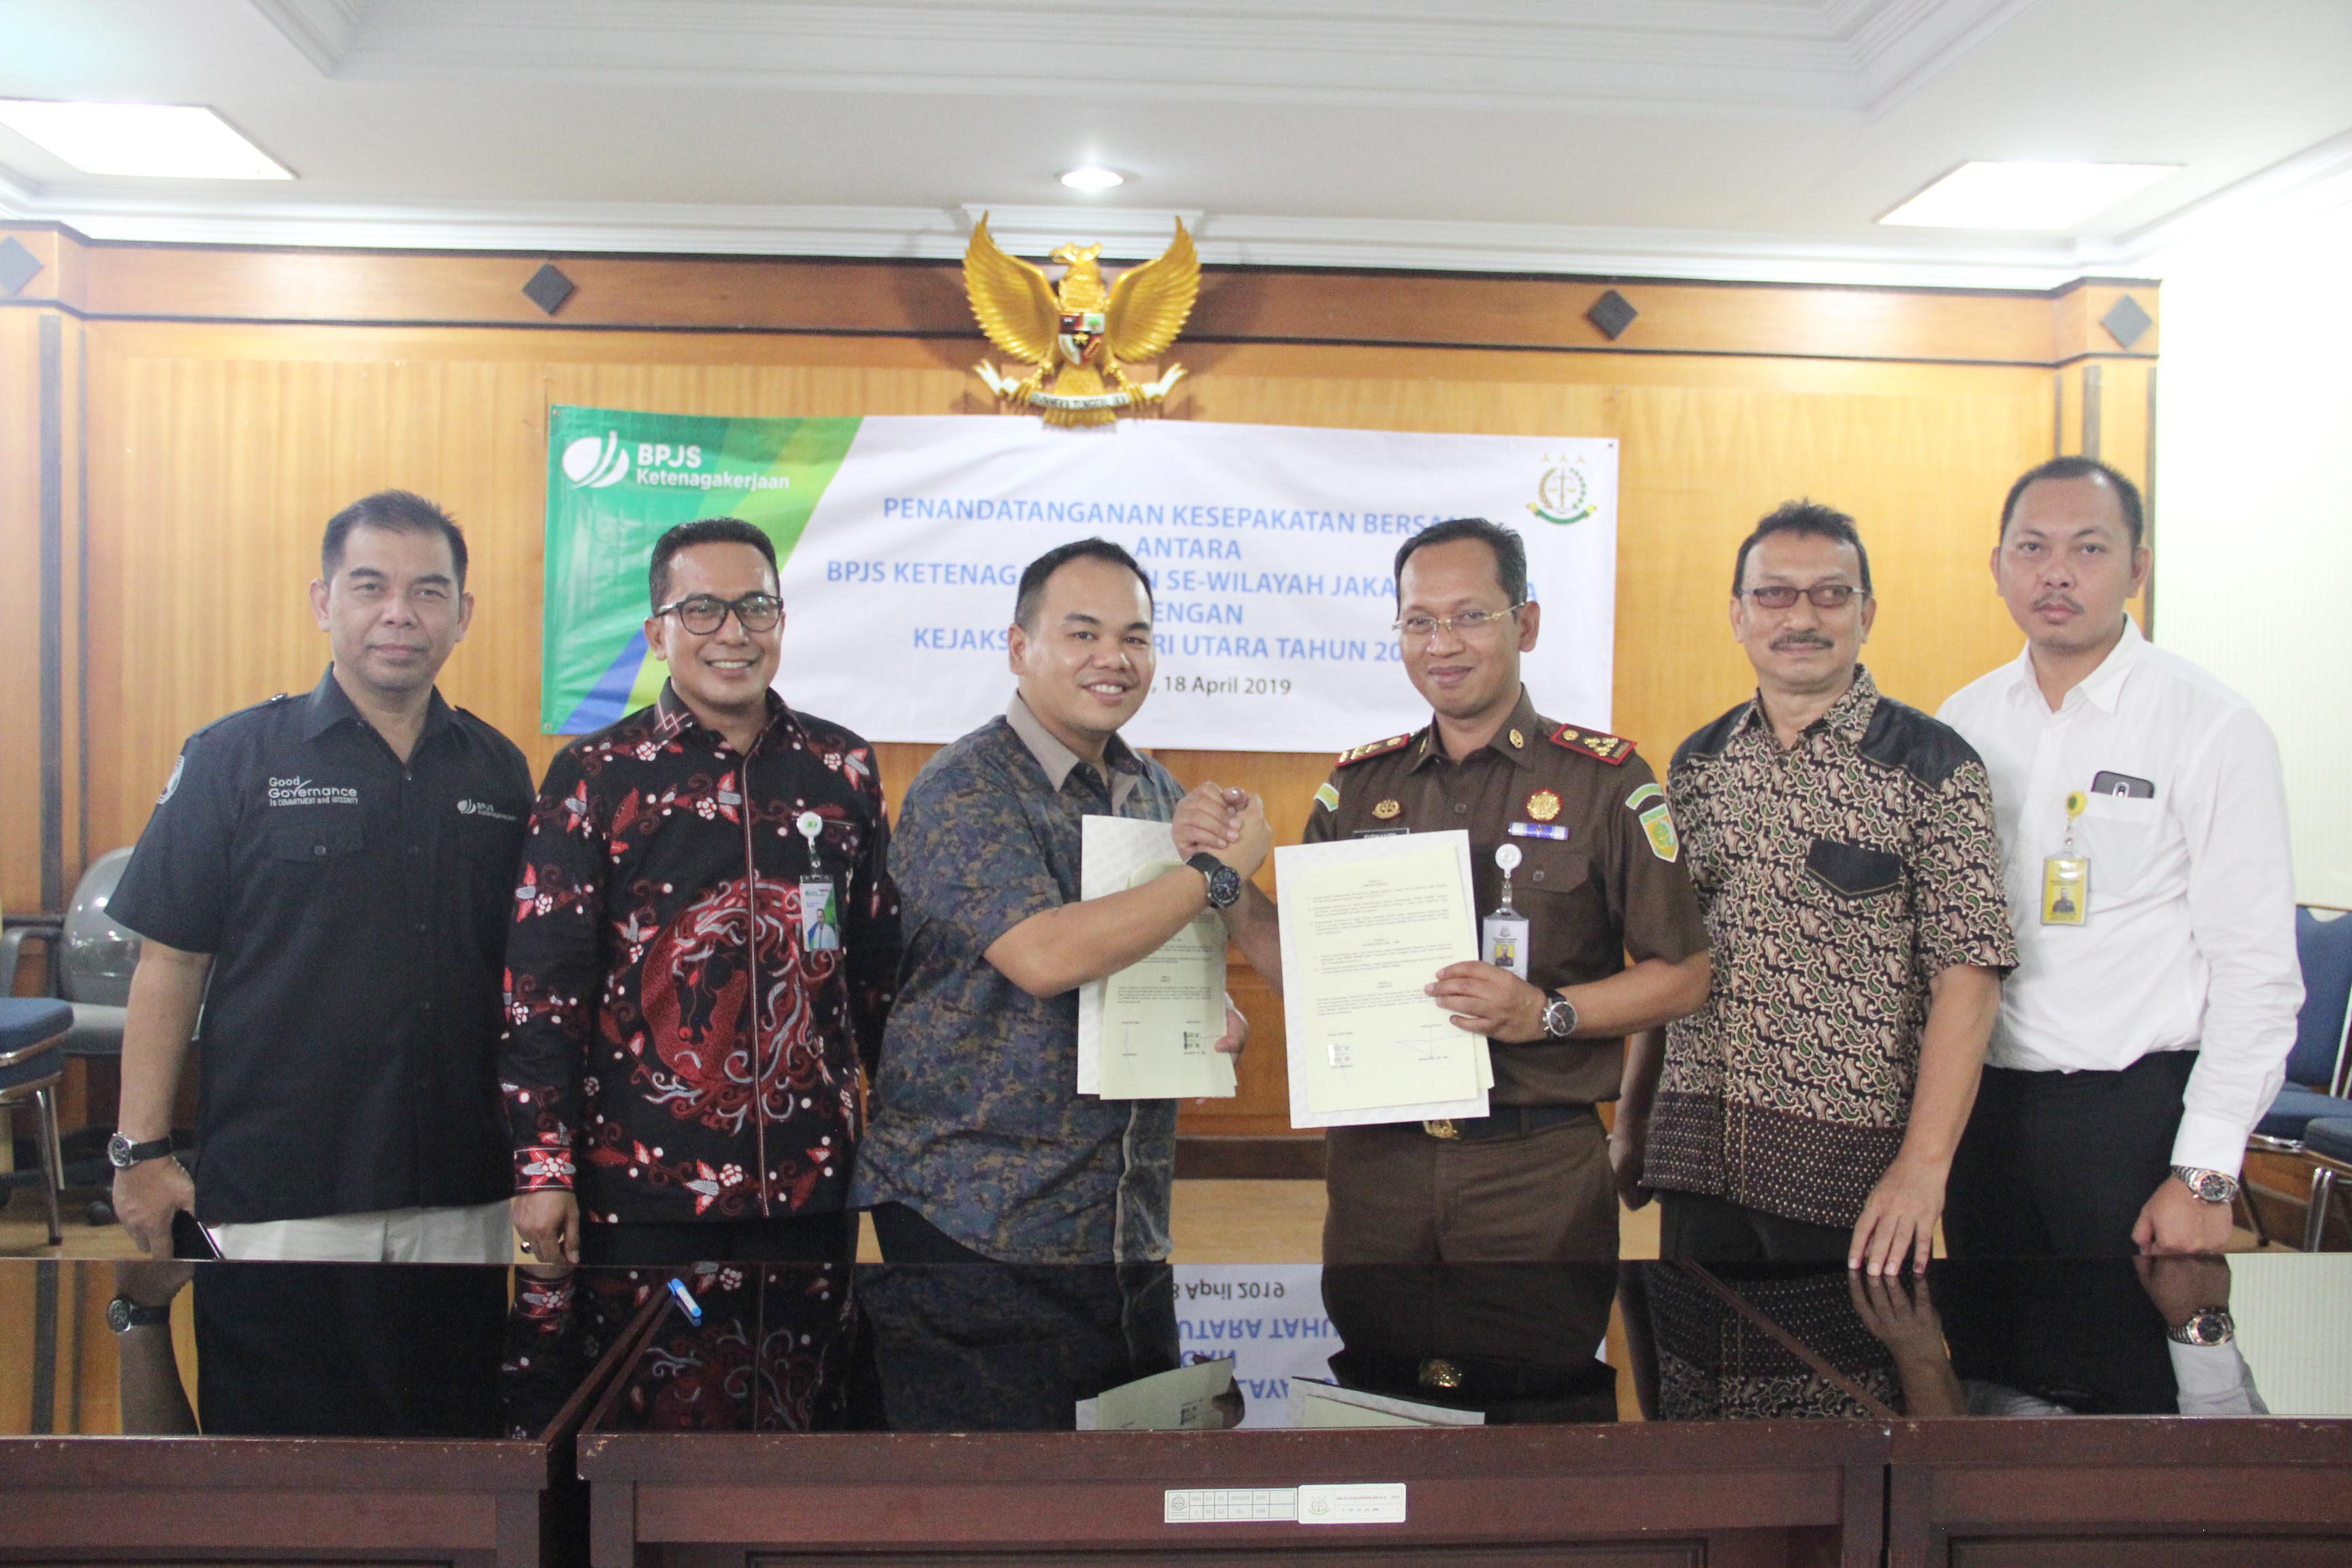 Mou Memorandum Of Understanding Antara Bpjs Ketenagakerjaan Se Wilayah Jakarta Utara Dengan Kejaksaan Negeri Jakarta Utara